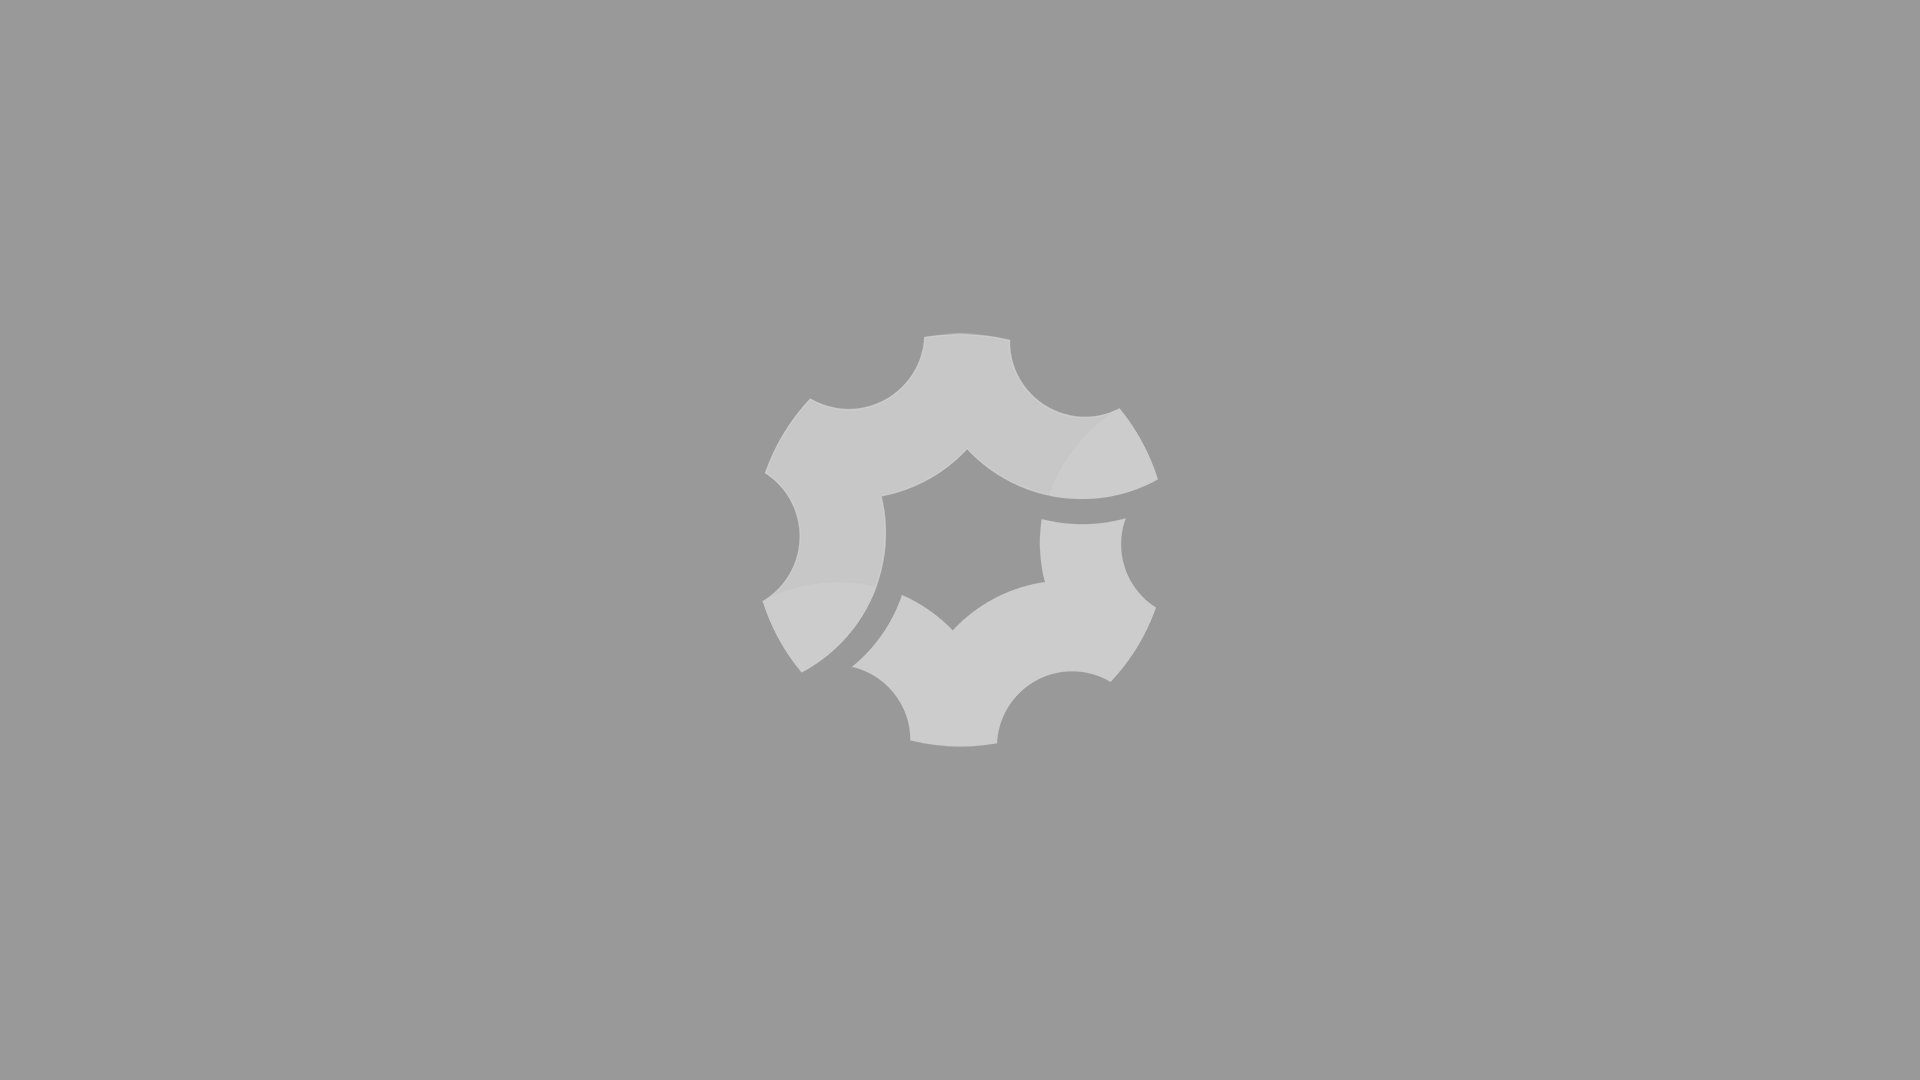 snowrunner_screenshot_2021.01.10_-_21.14.58.81.png